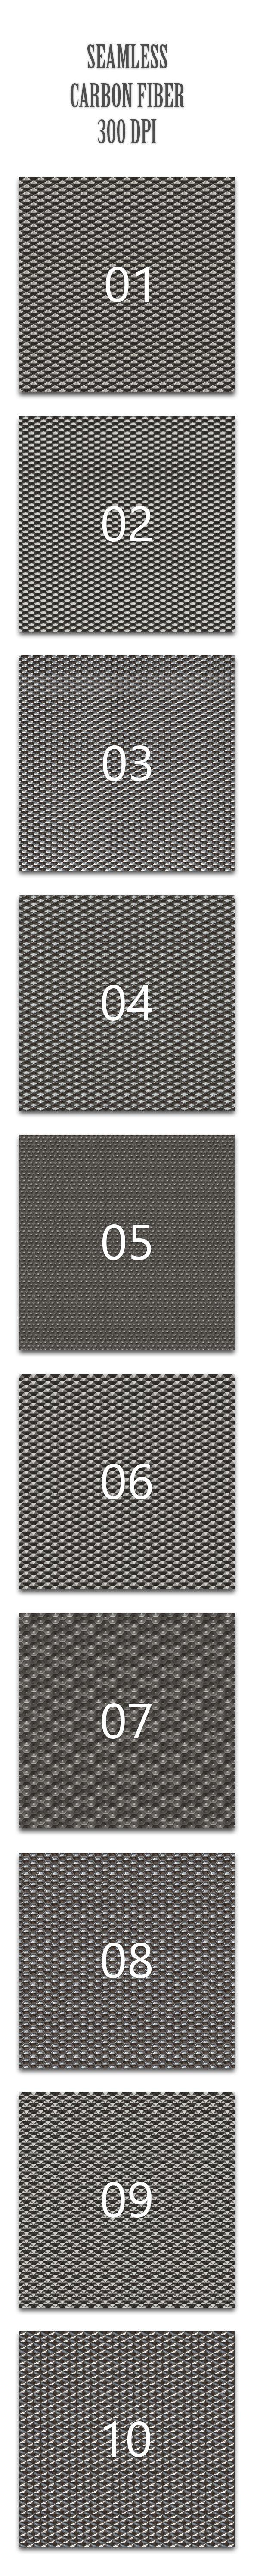 Seamless Carbon Fiber - Textures / Fills / Patterns Photoshop